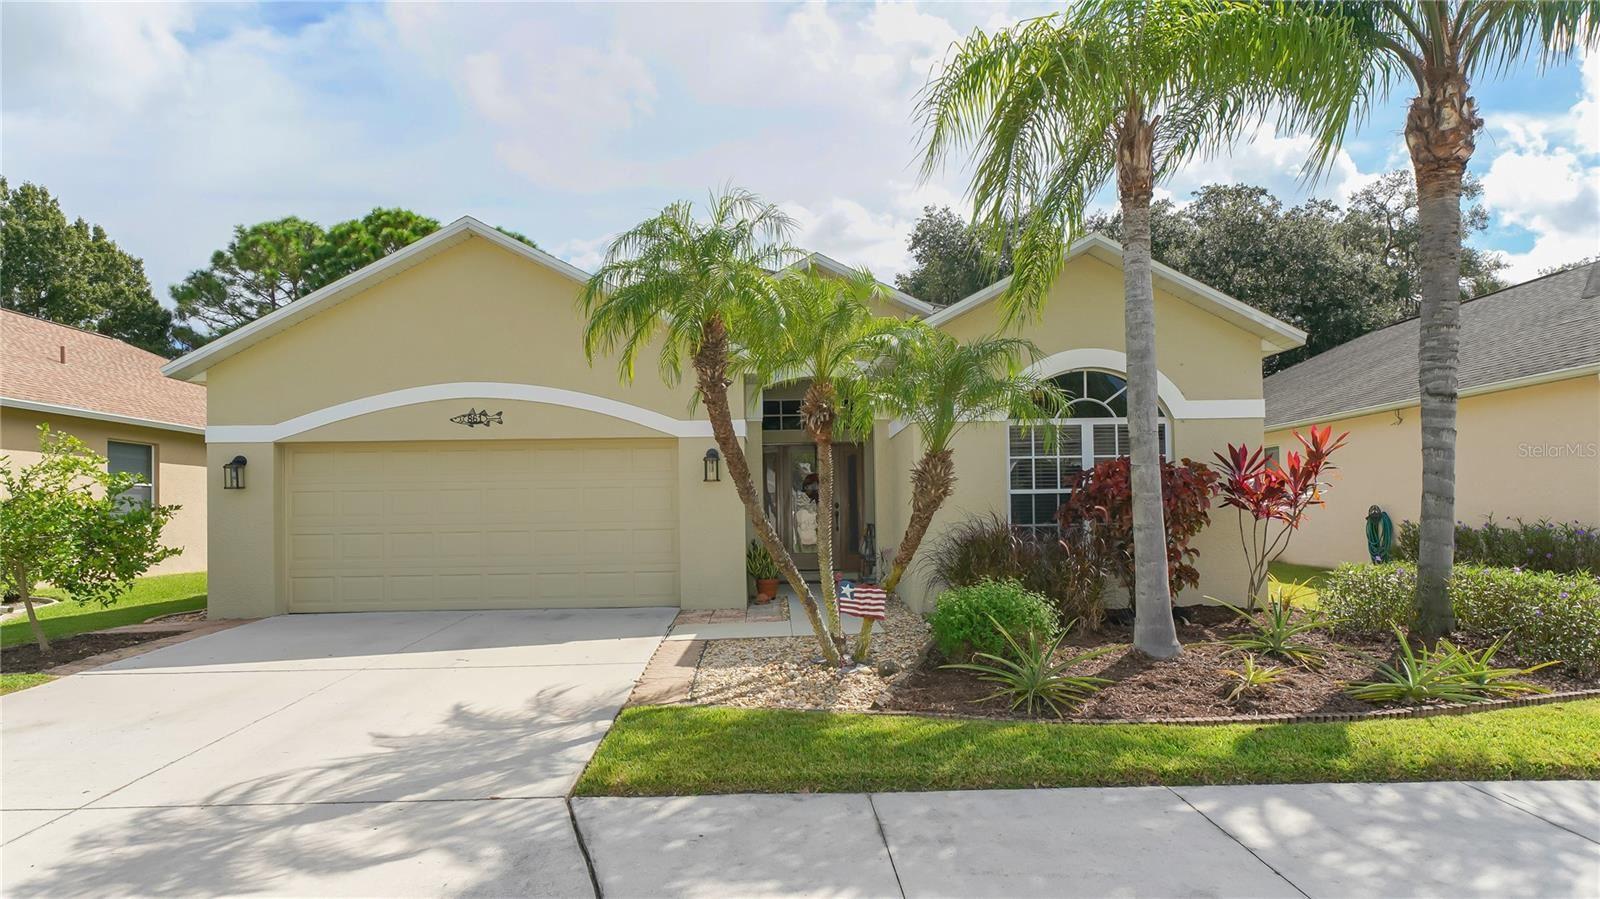 861 GREYSTONE LANE, Sarasota, FL 34232 - #: D6121587